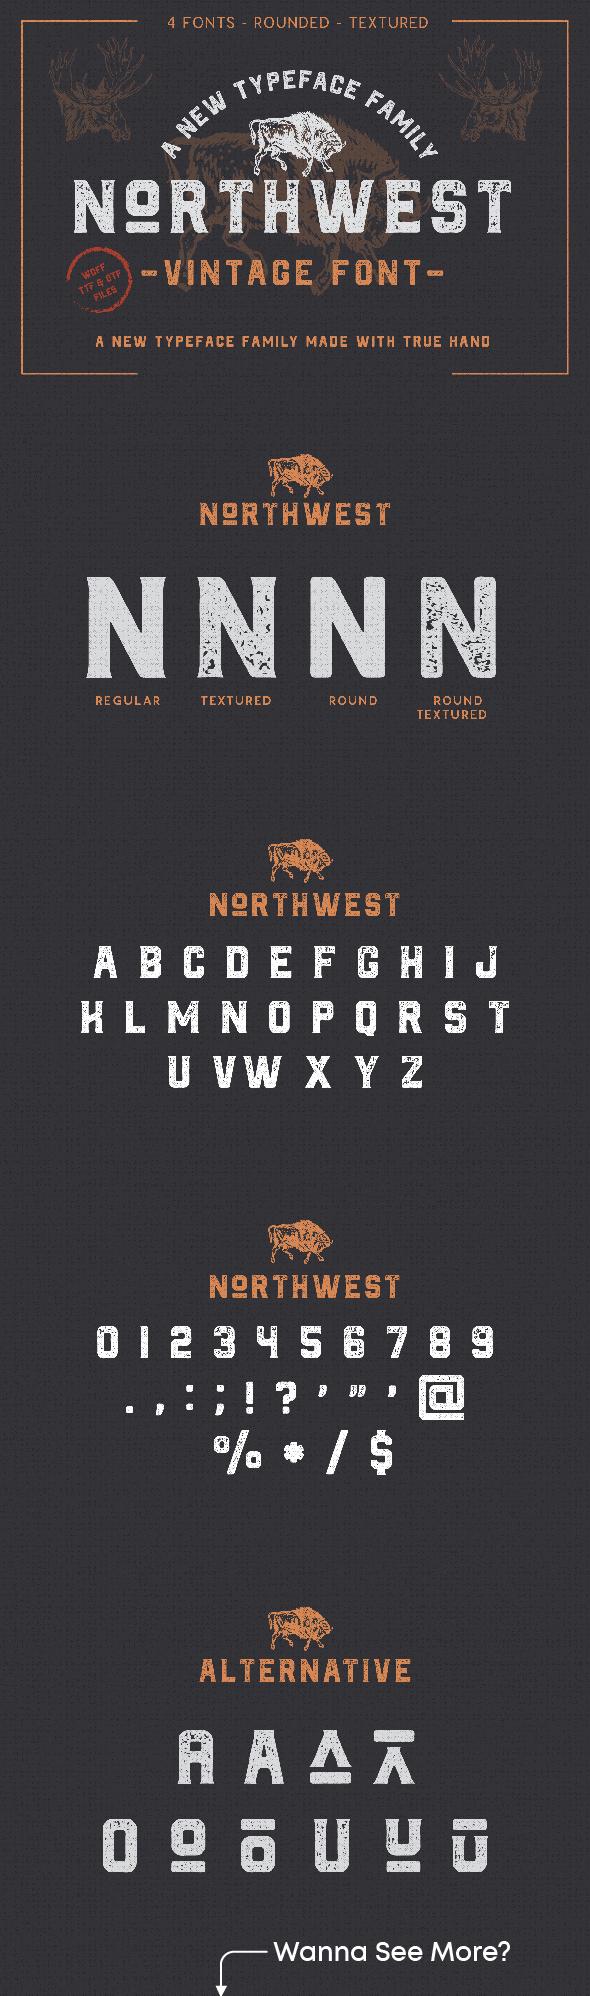 The Northwest - Vintage Font - Sans-Serif Fonts